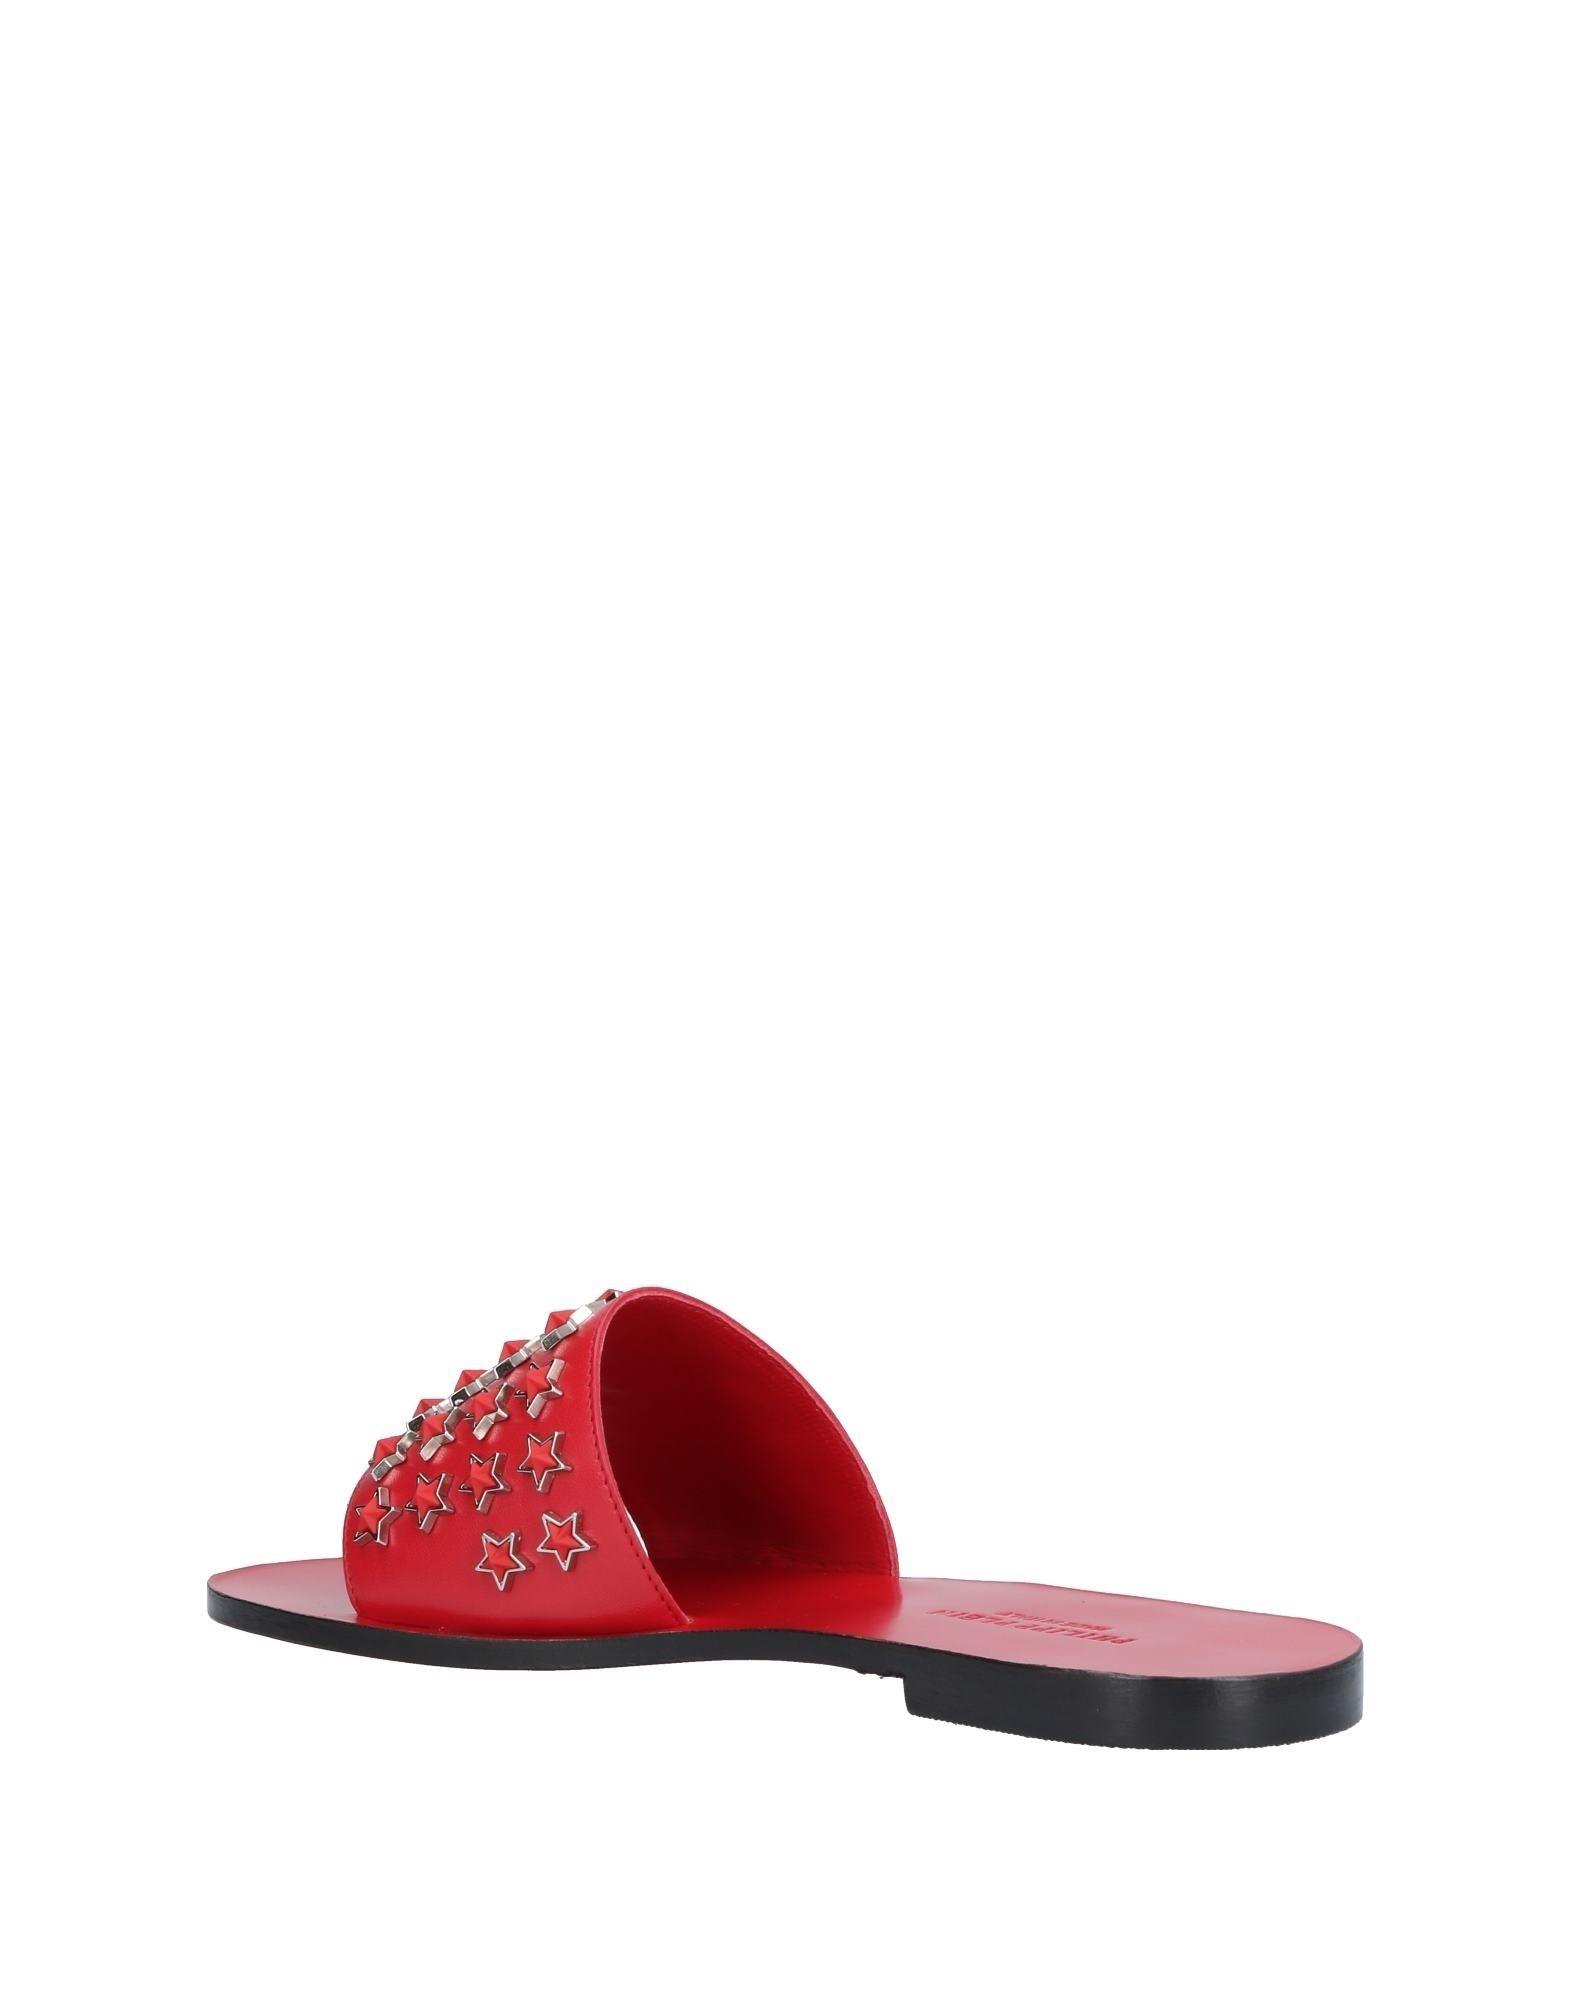 Stilvolle billige Schuhe Philipp Plein 11433106OV Sandalen Damen  11433106OV Plein b545e1